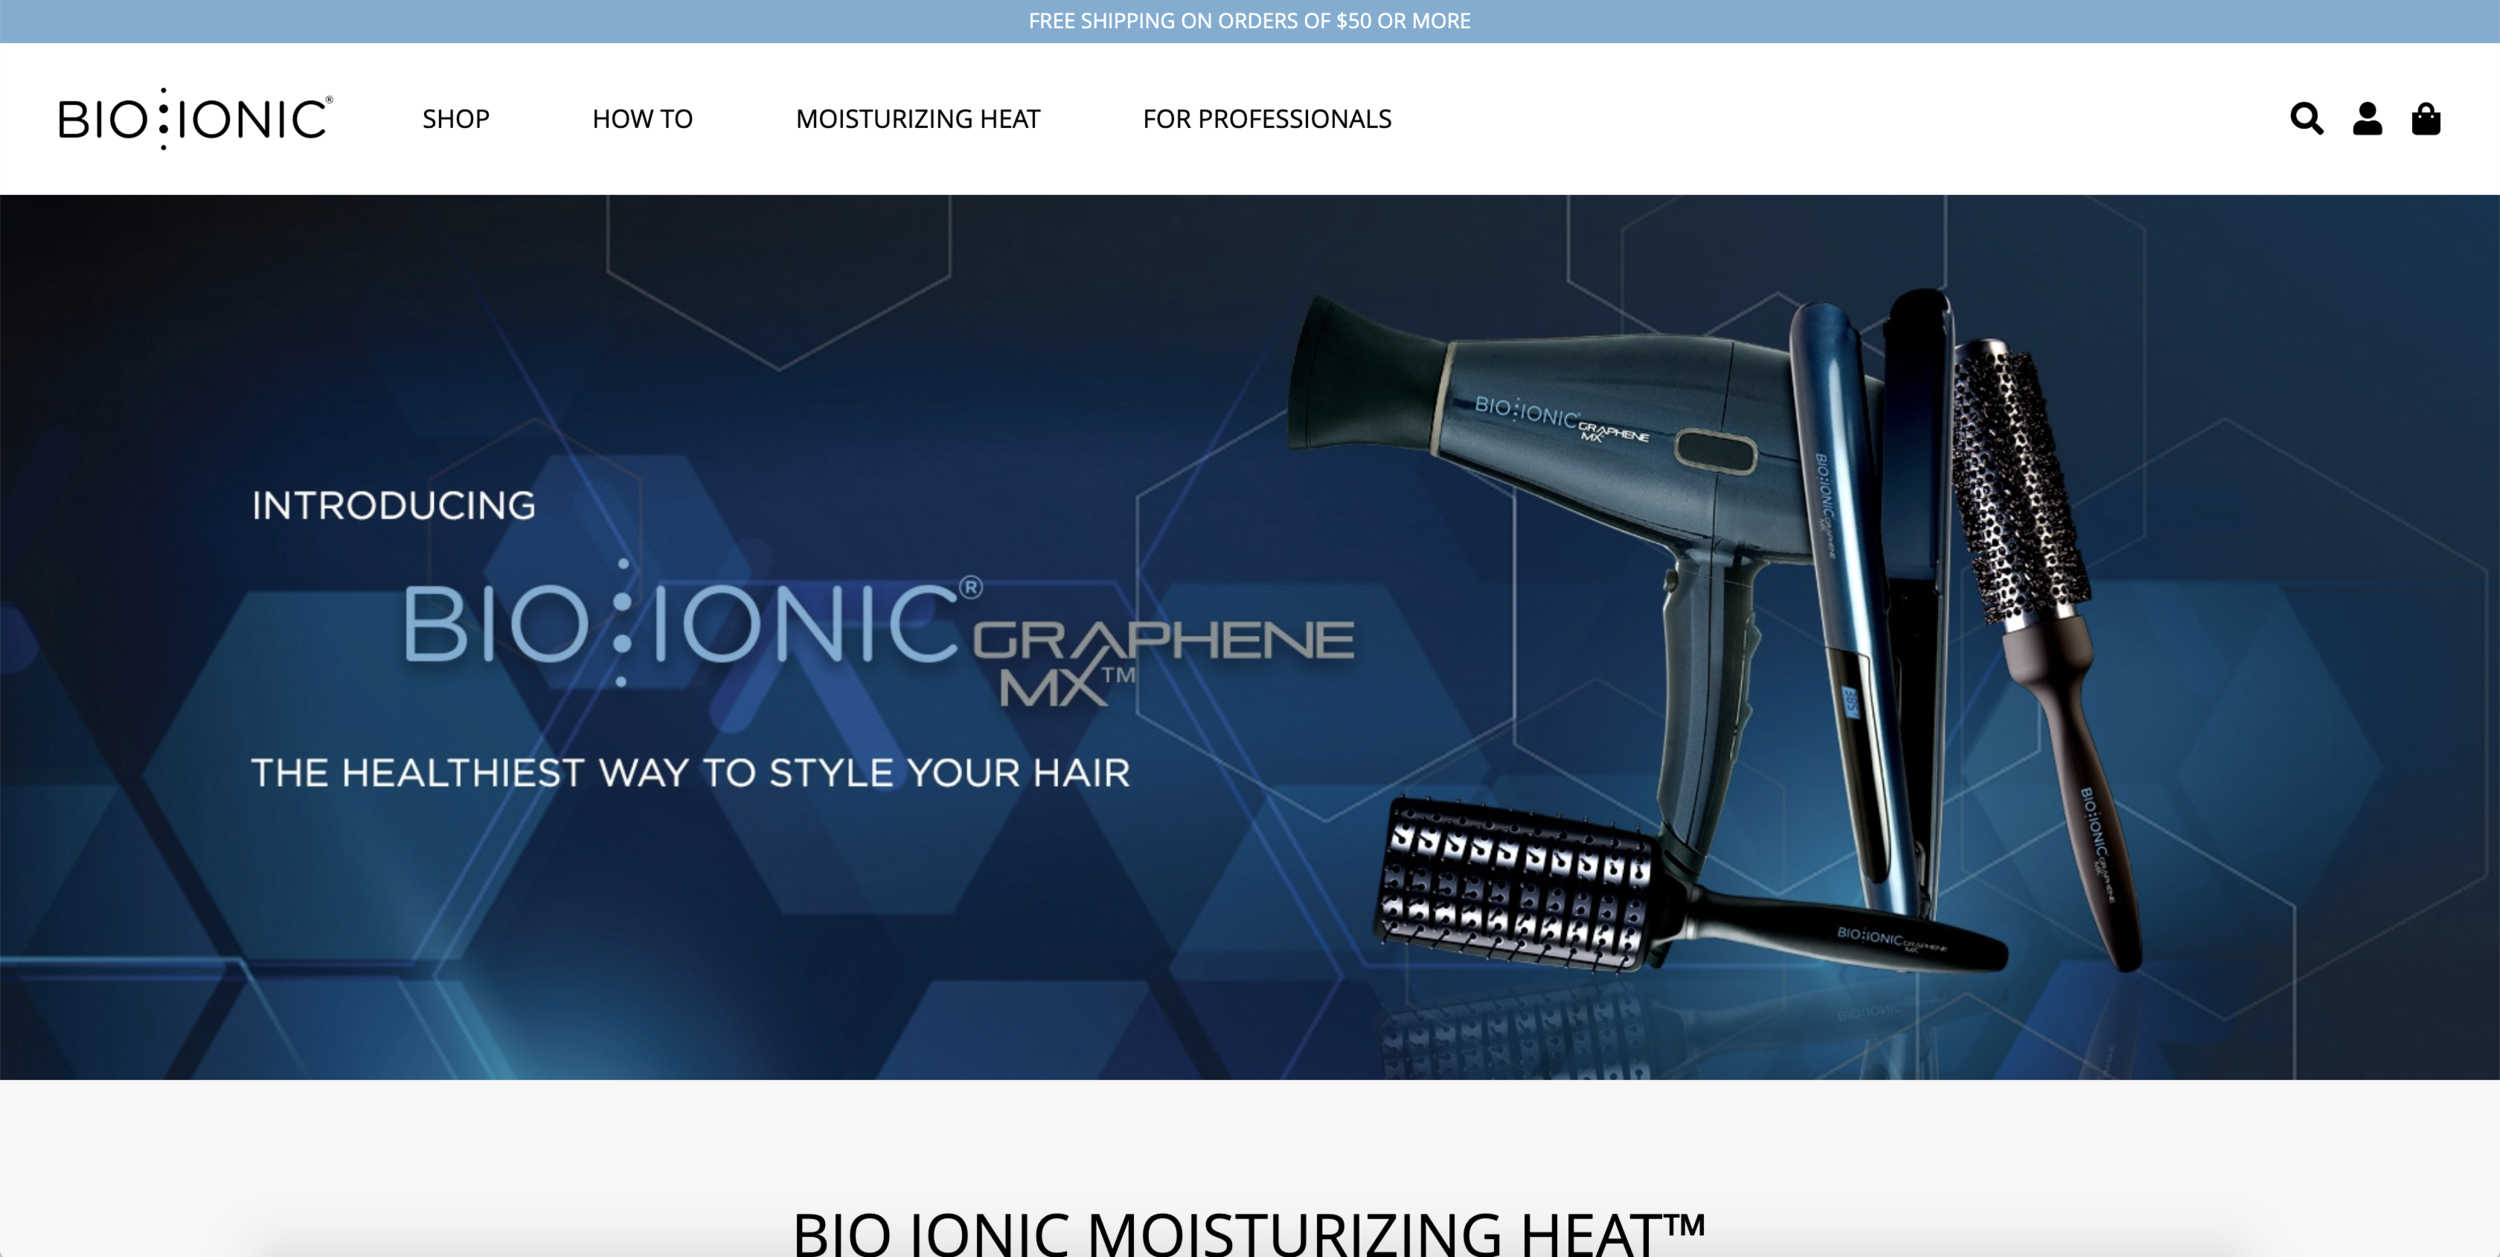 Bio Ionic Website